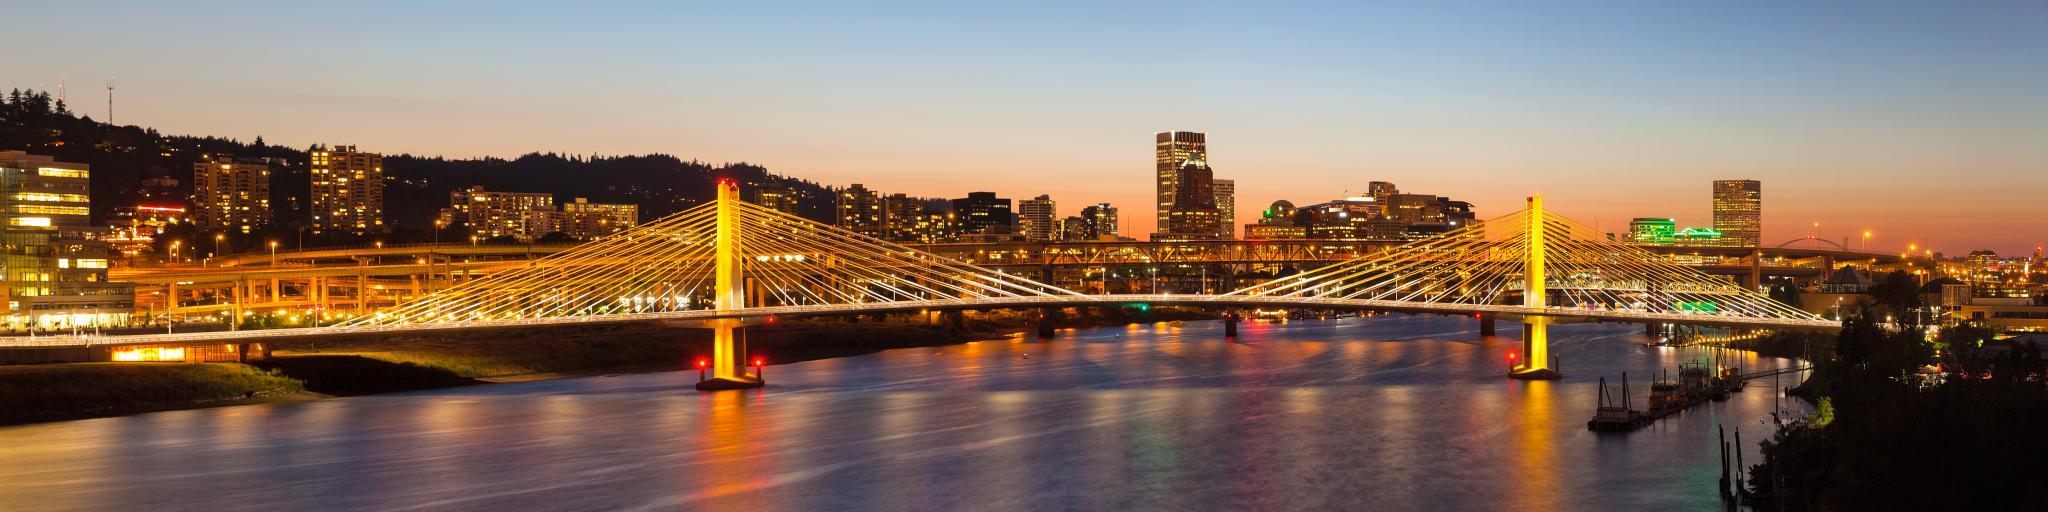 Tilikum Crossing Bridge with Portland Oregon Downtown City